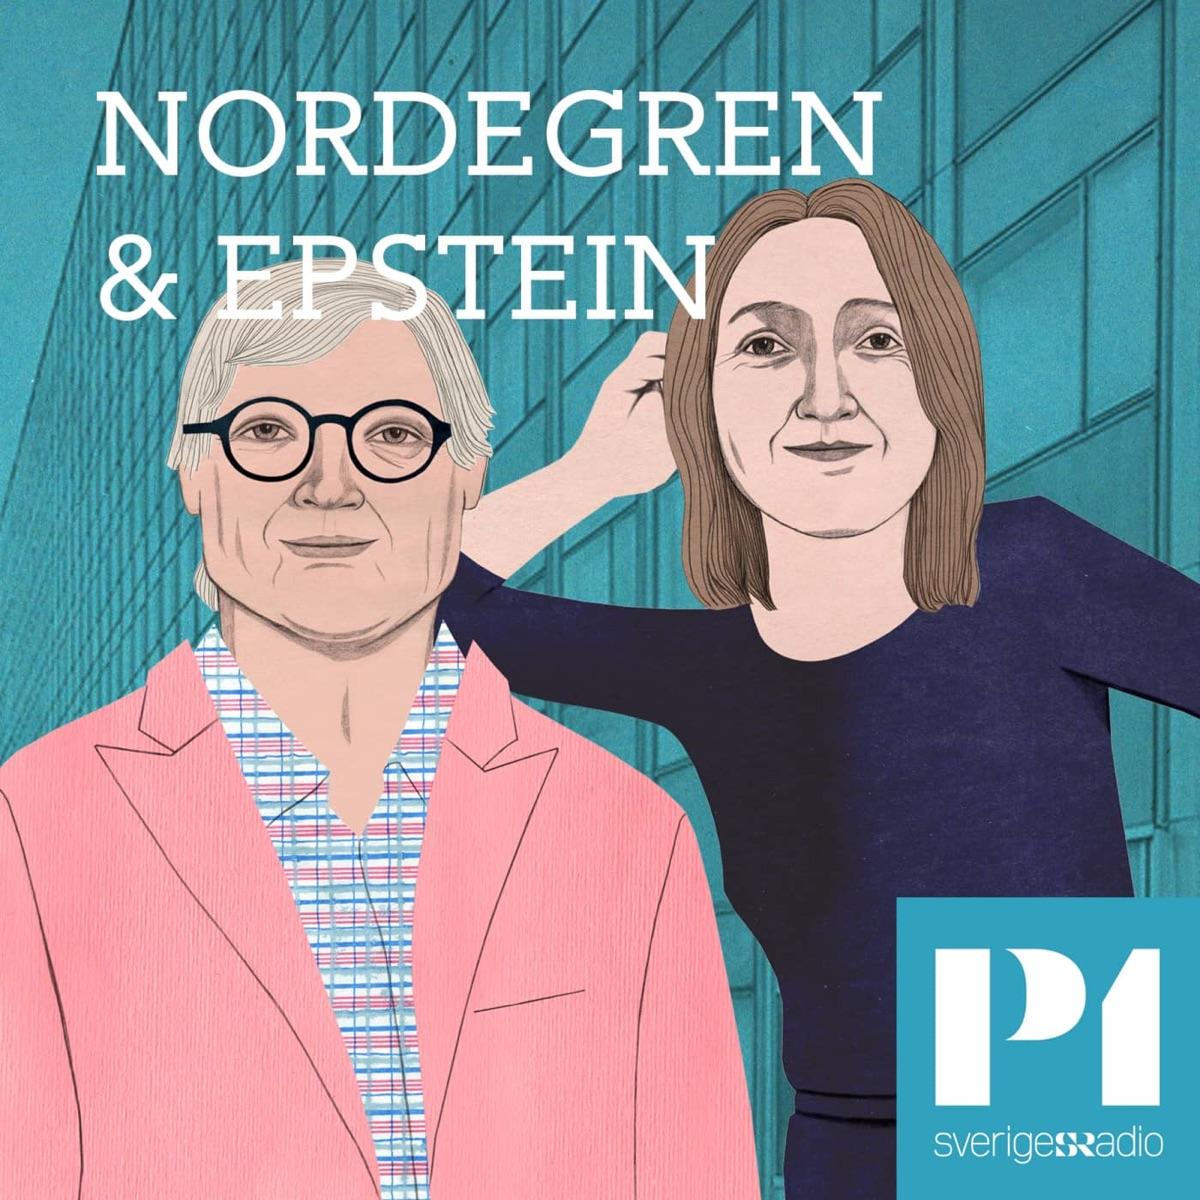 Nordegren & Epstein i P1